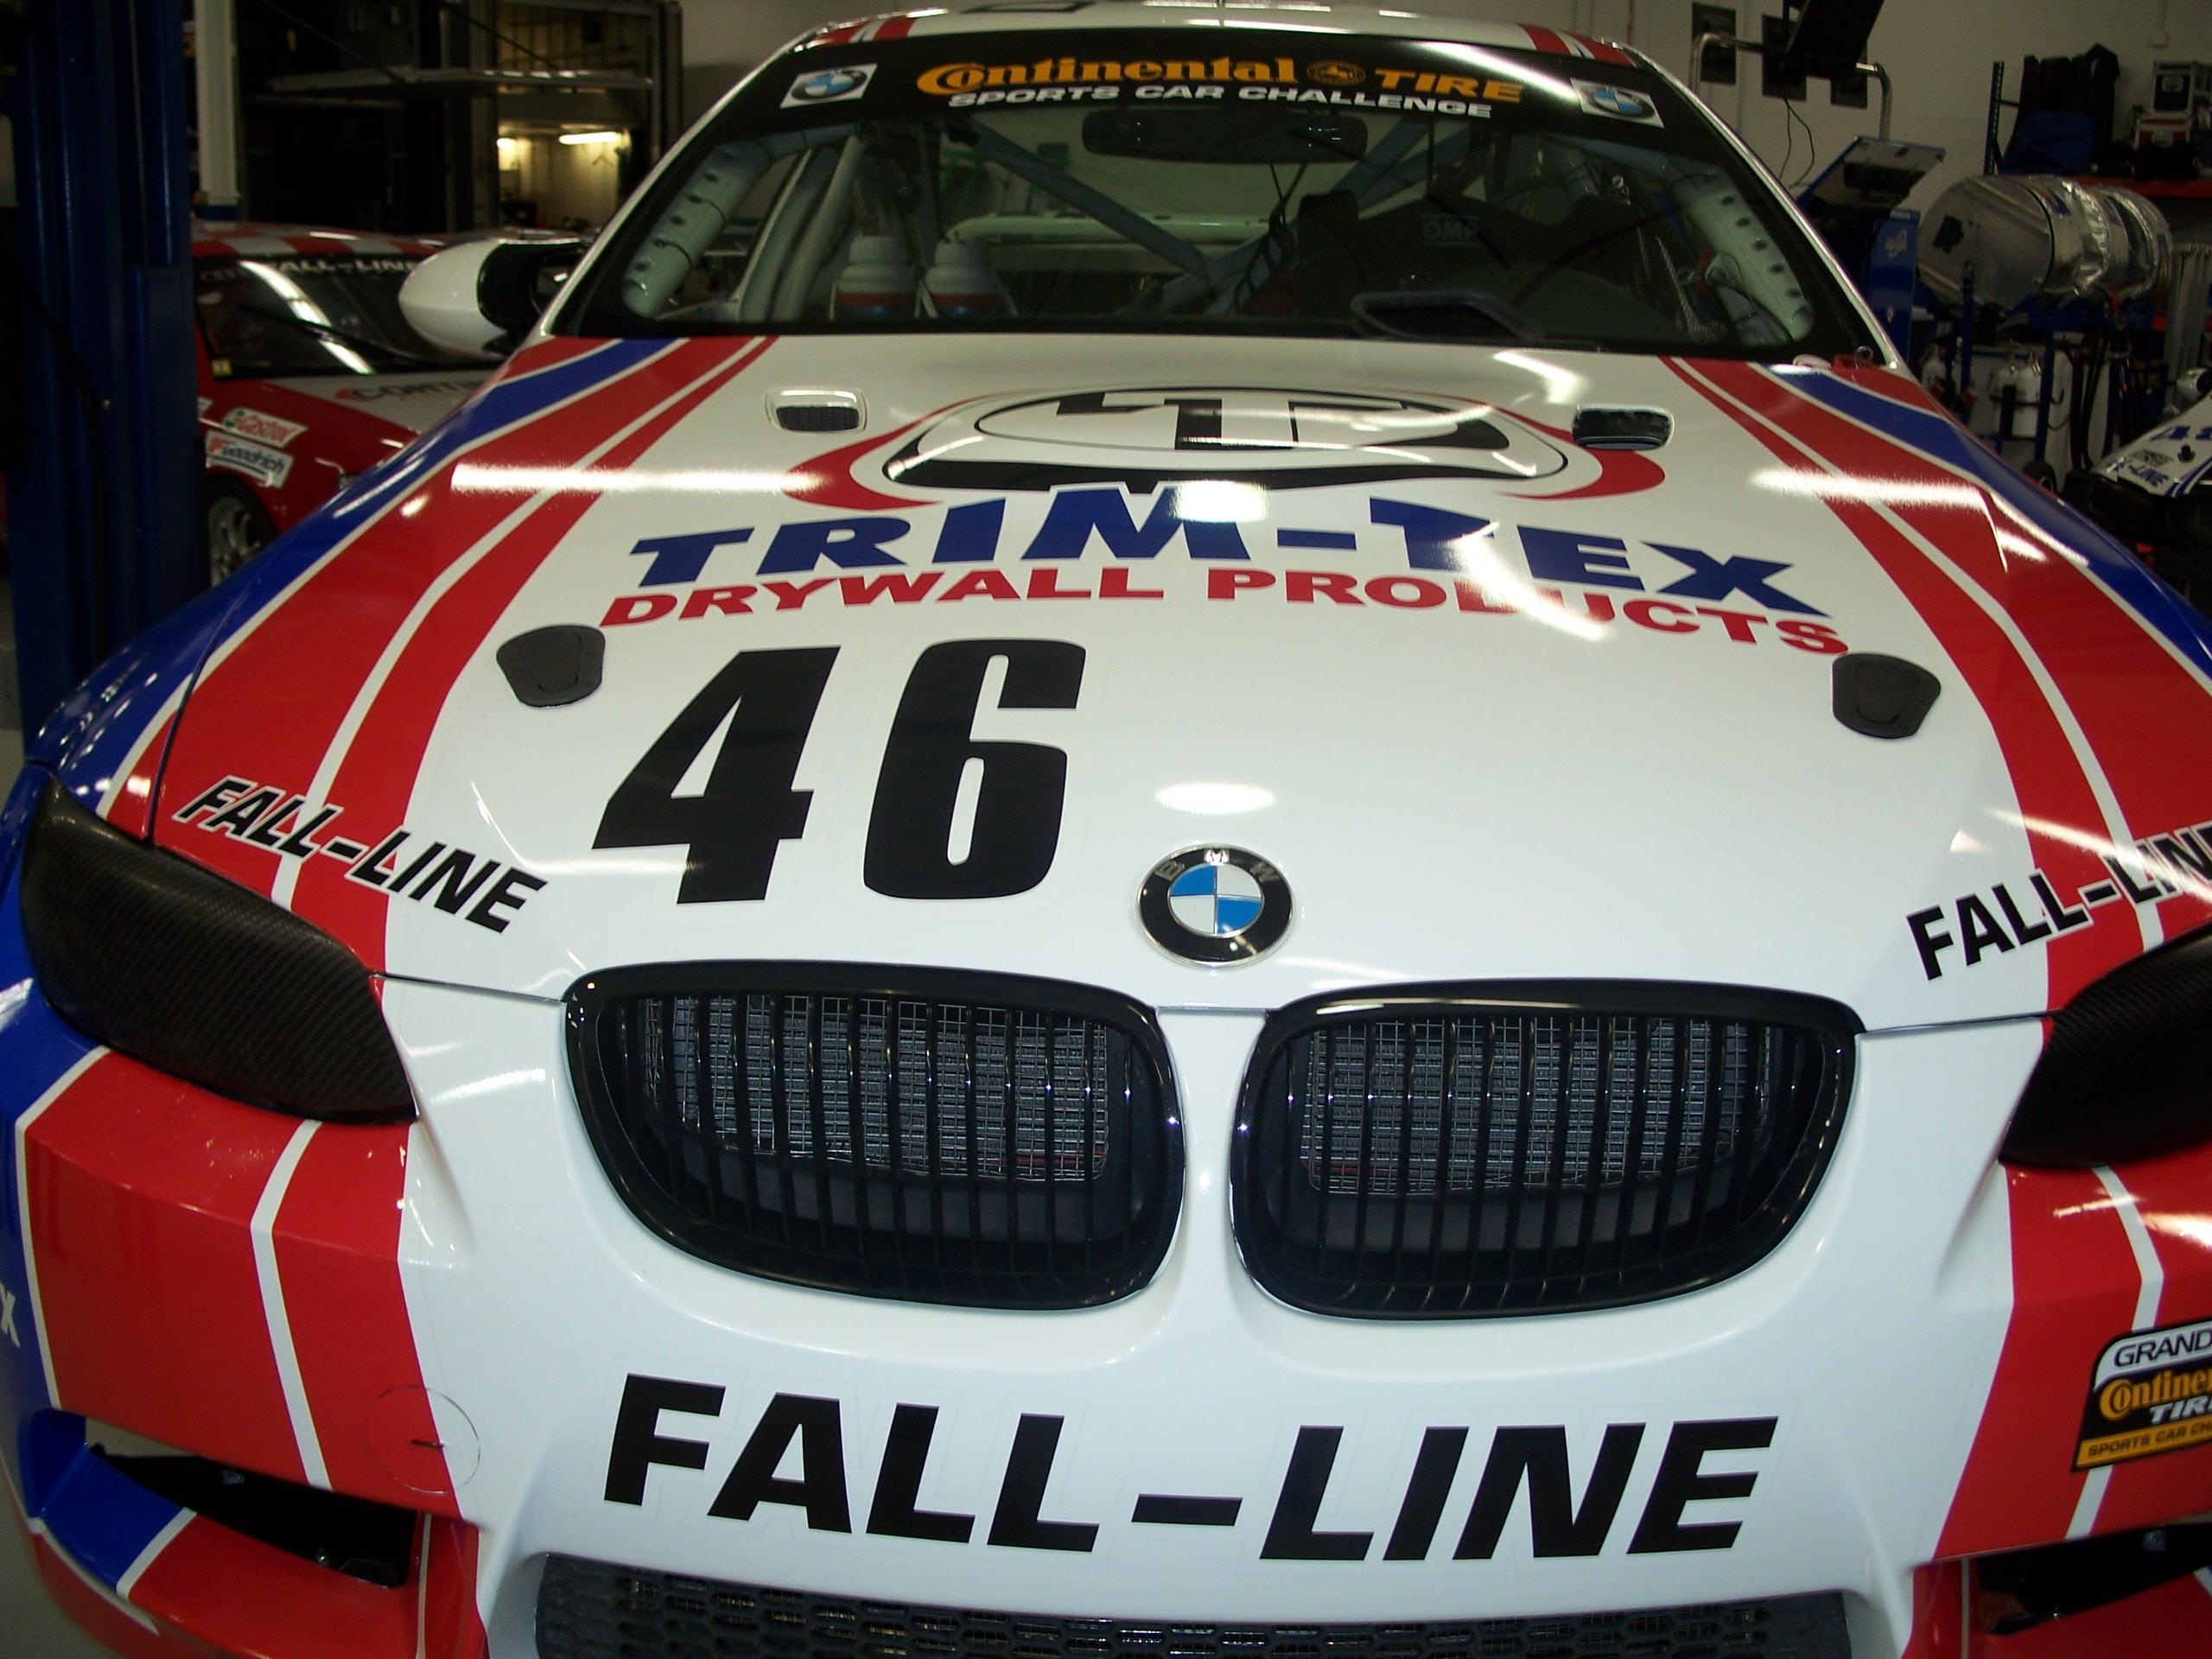 Joe Koenig BMW